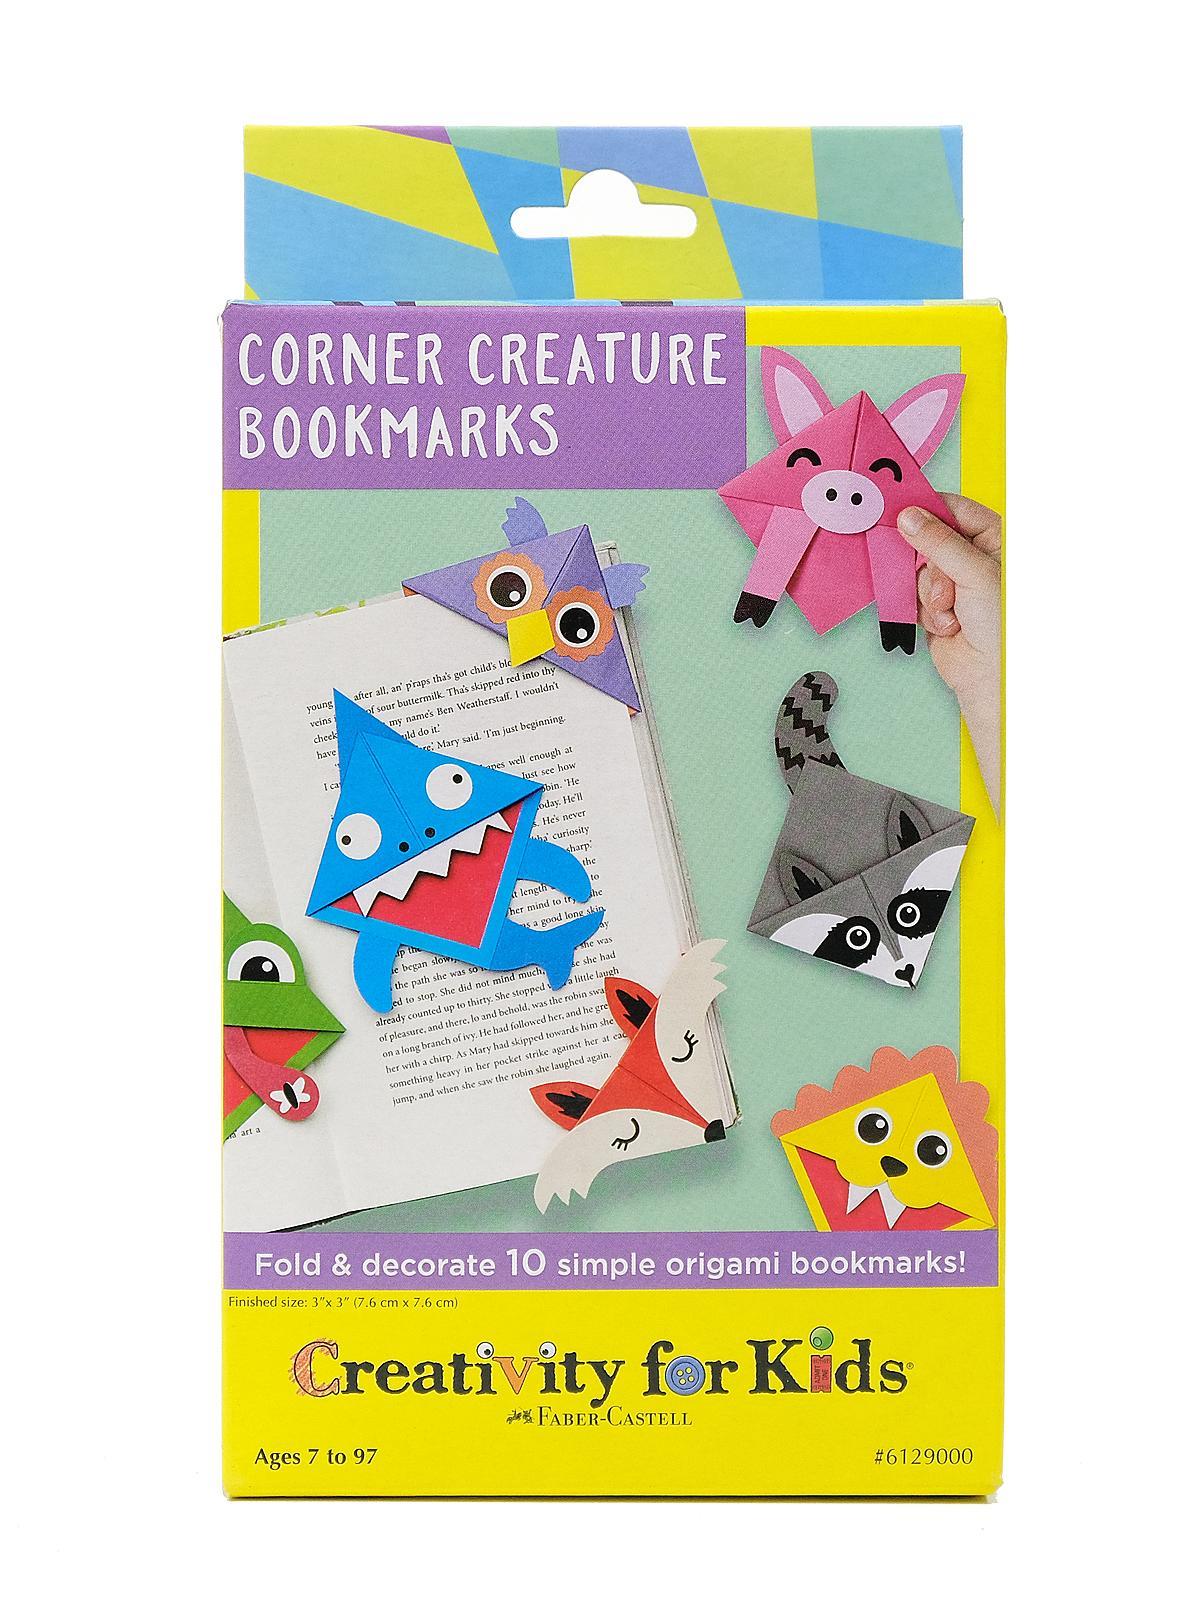 Creativity For Kids - Corner Creature Bookmarks Mini Kit